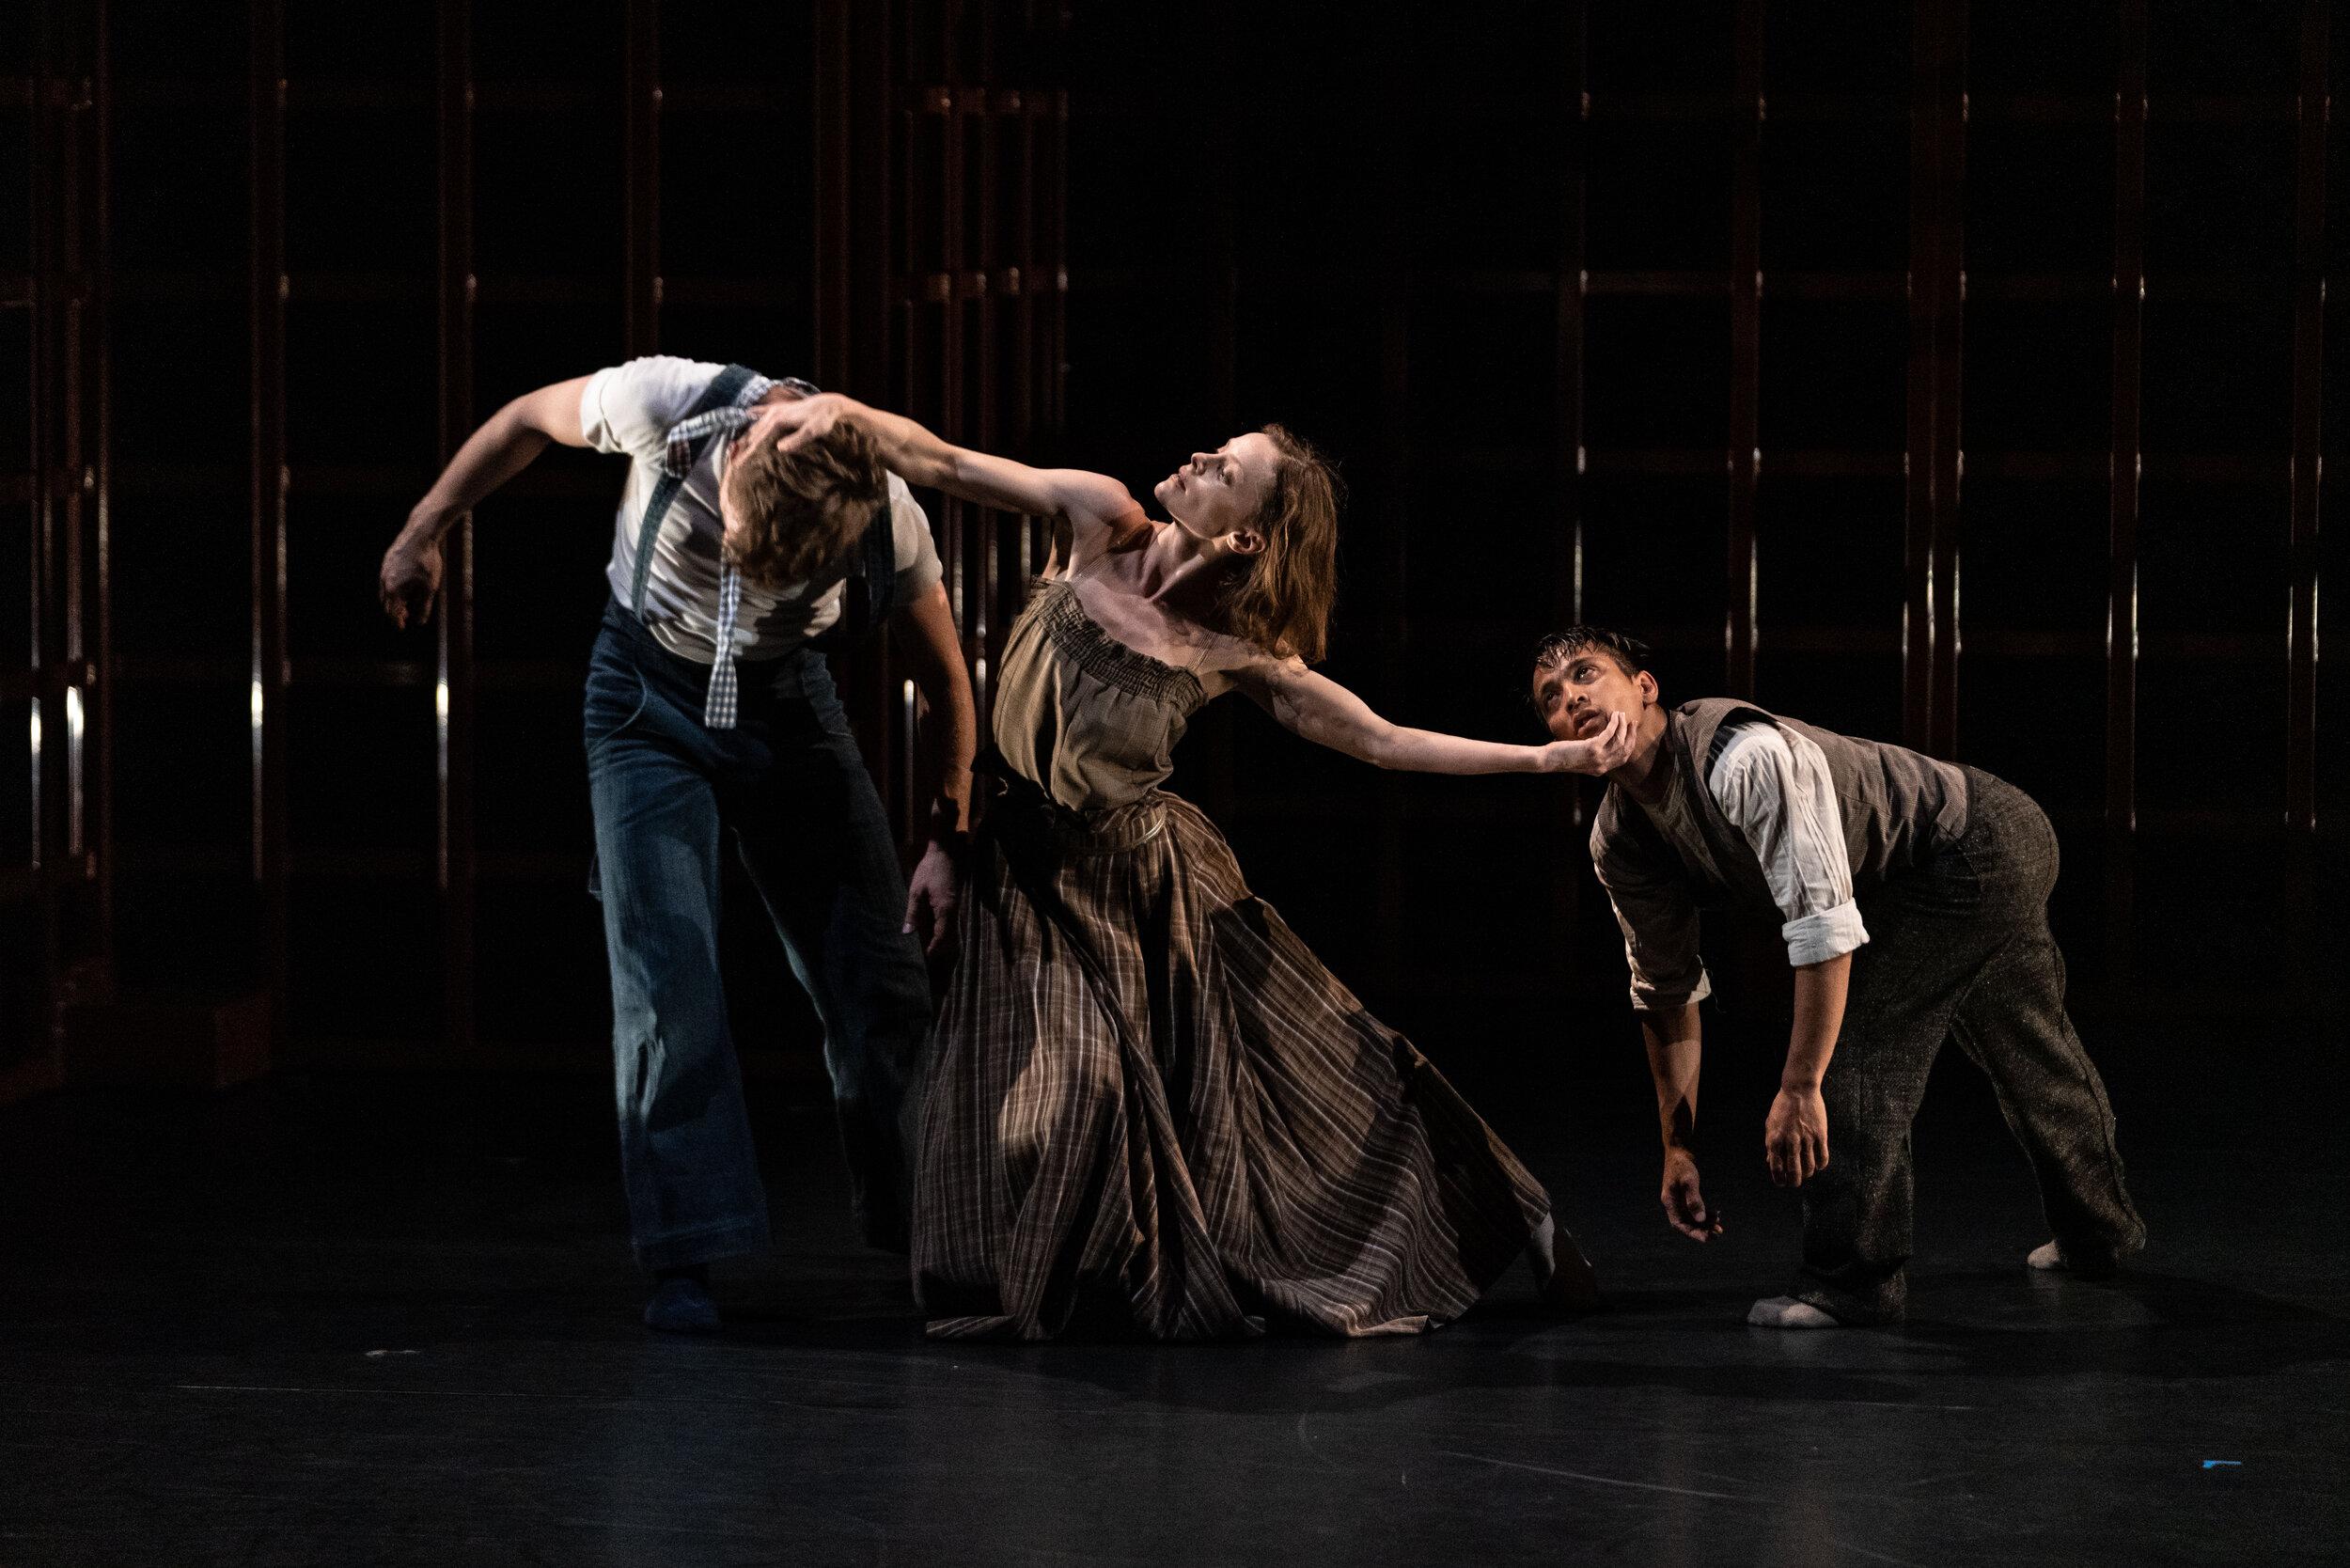 ORBO NOVO - Nagelhus Schia Productions (NO)25 October 18.30The Norwegian National Opera and Ballet